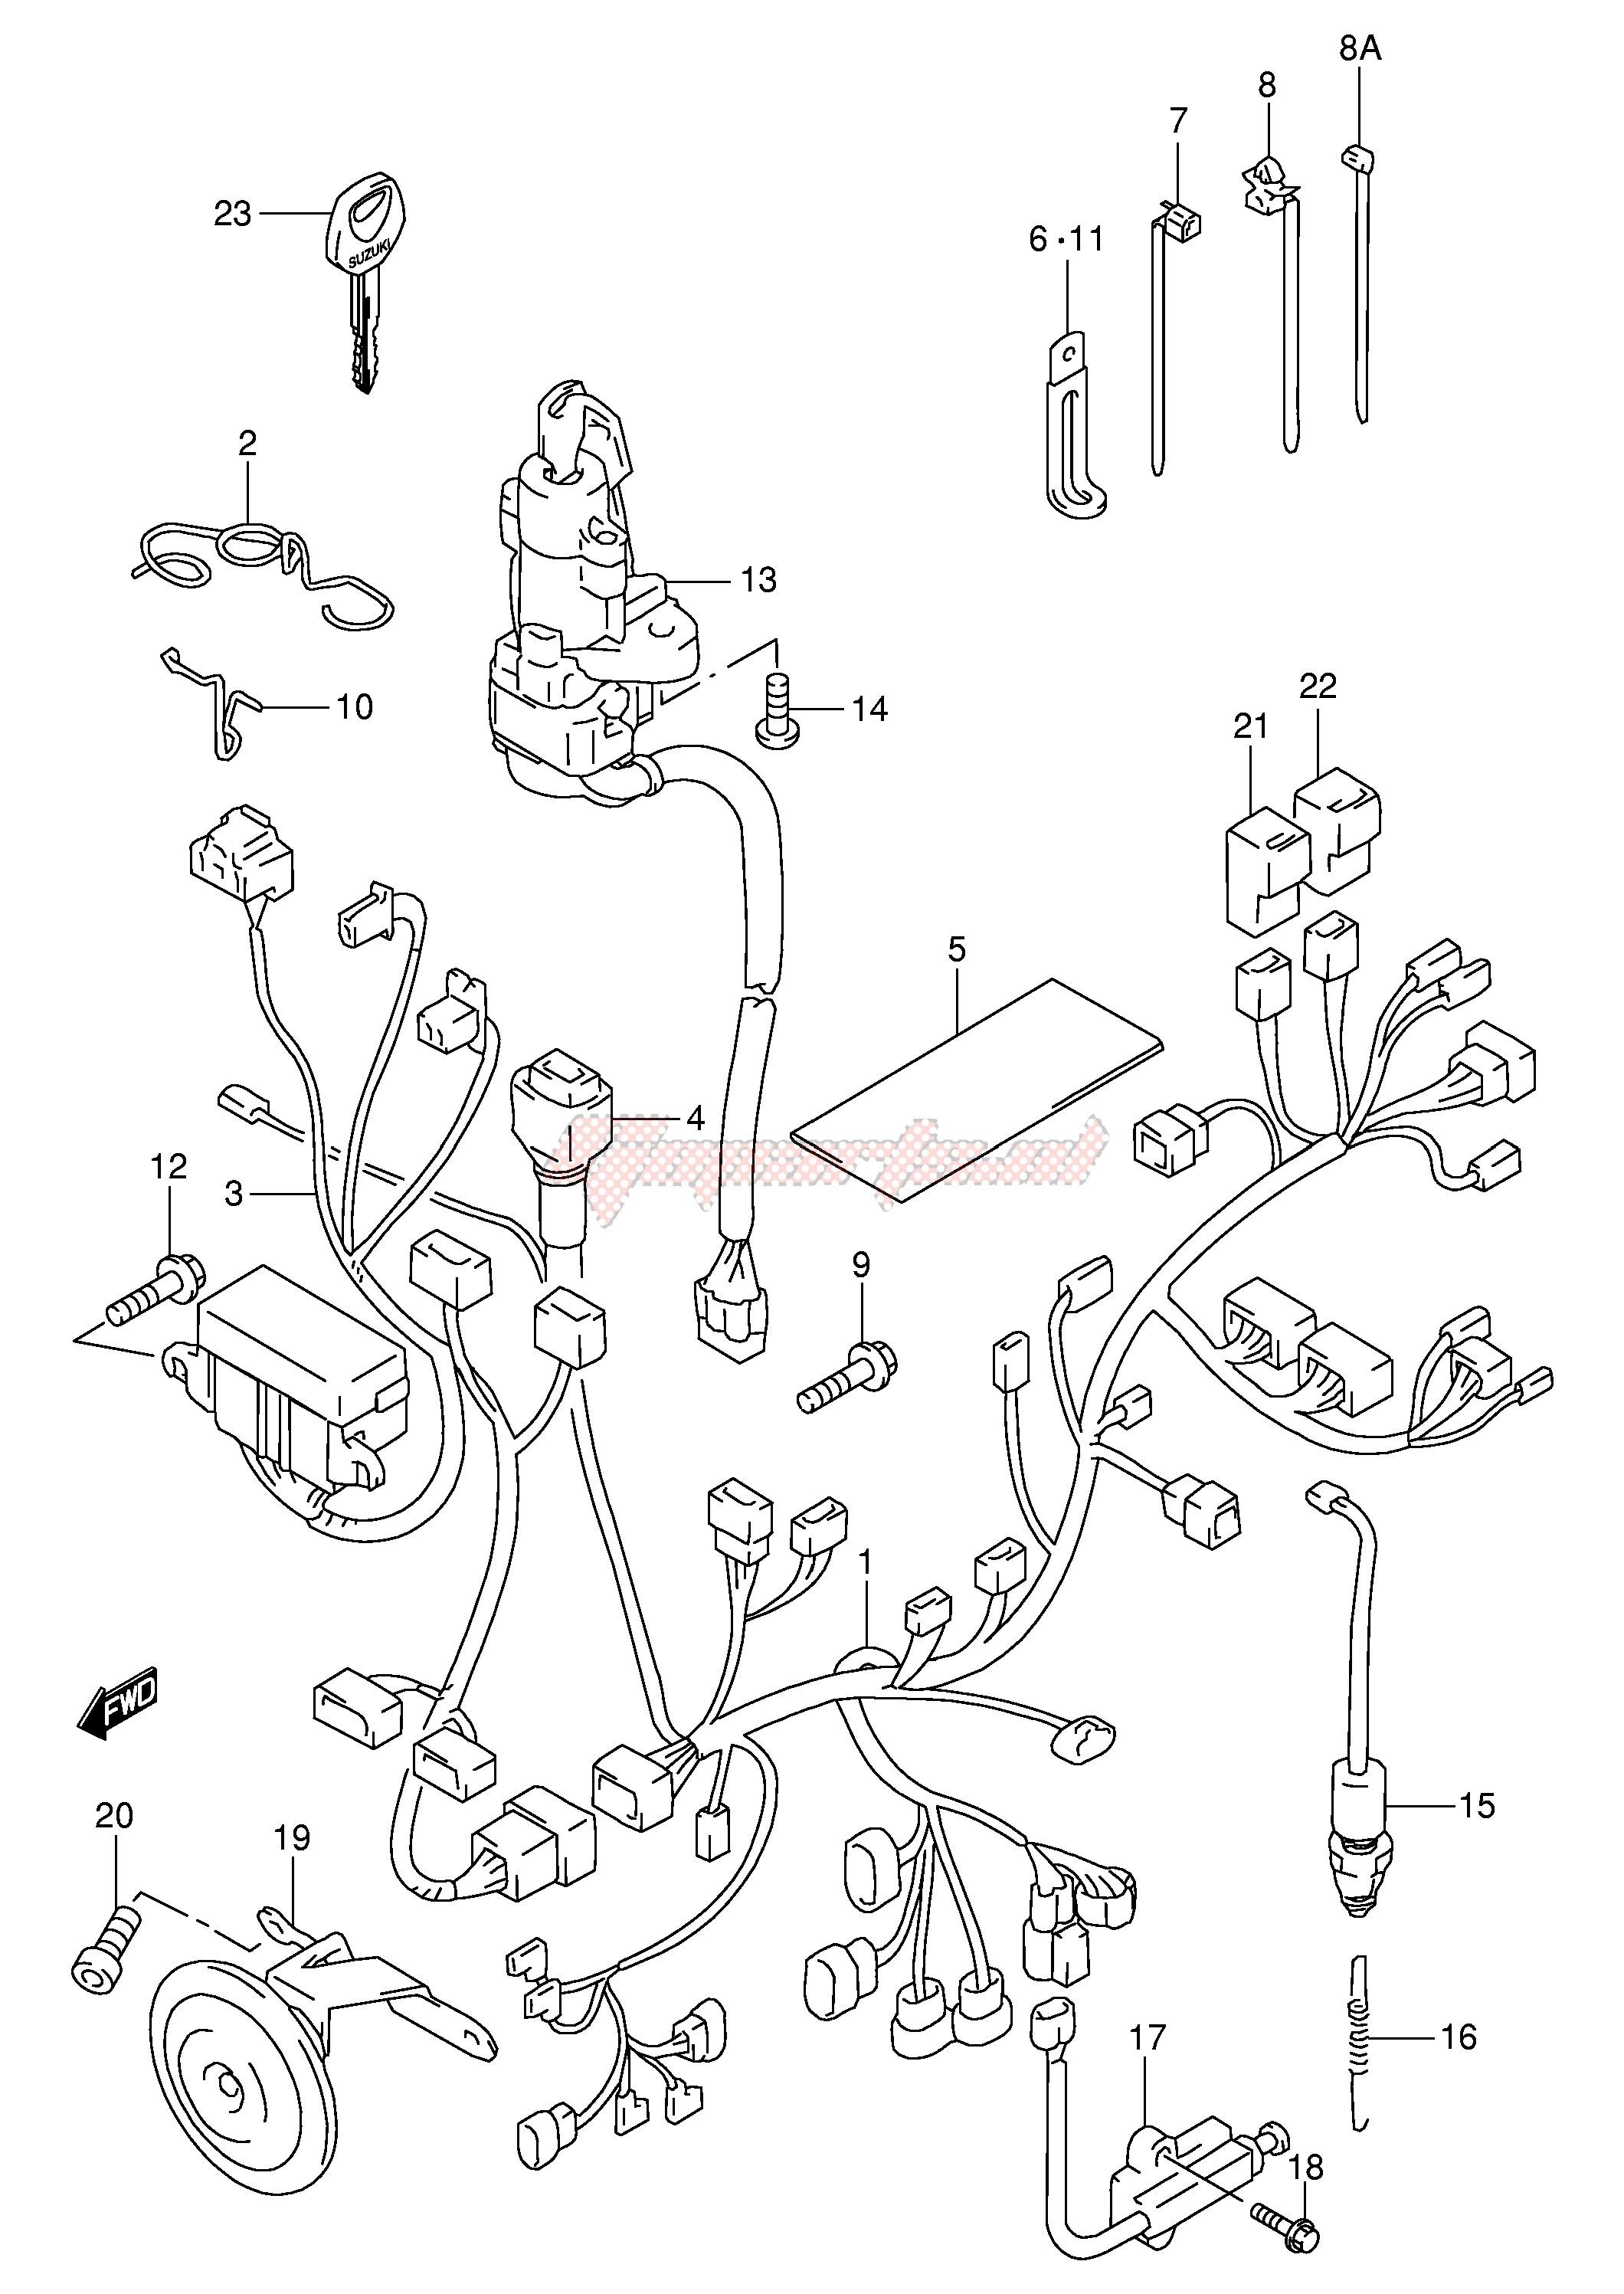 tl1000s wiring diagram suzuki tl1000s wiring diagram wiring diagrams all  suzuki tl1000s wiring diagram wiring